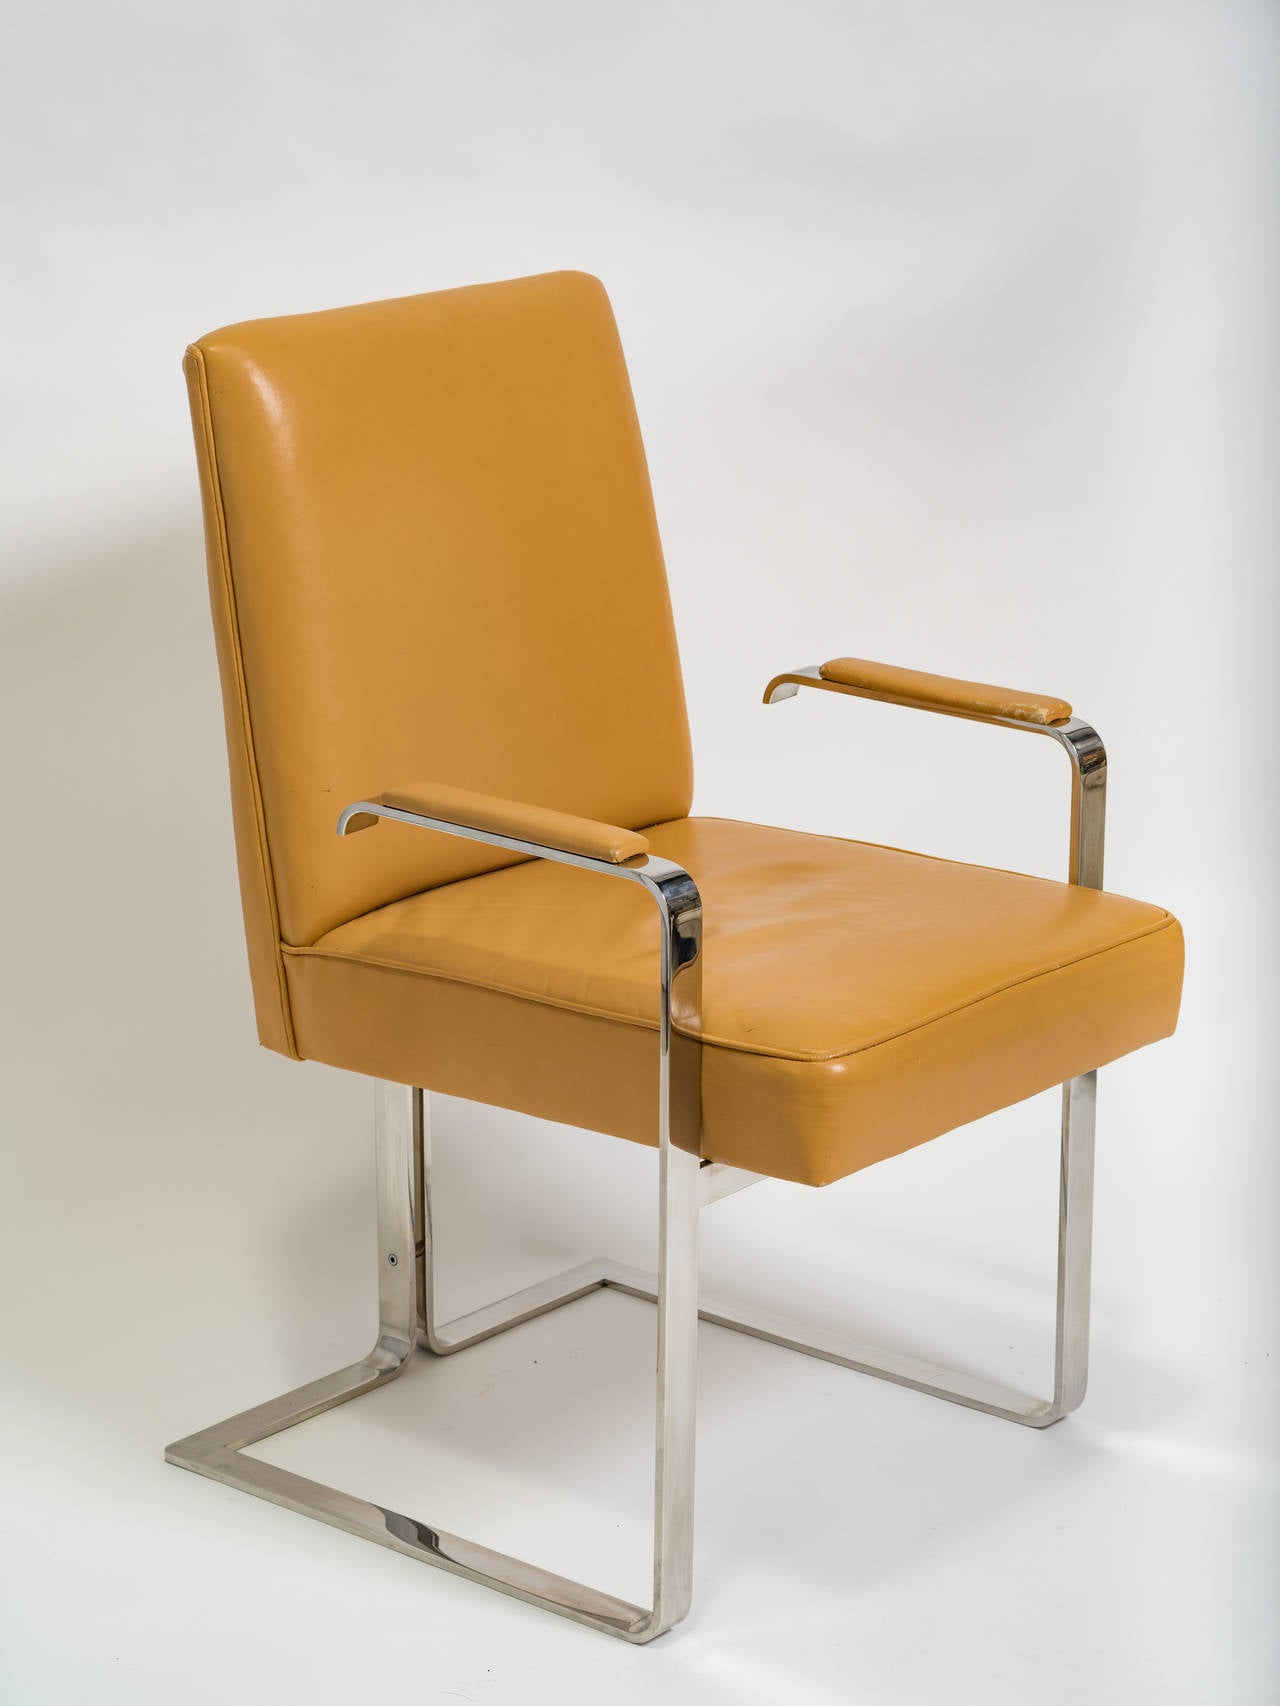 Vladimir Kagan Chrome and Leather Chair For Sale 1